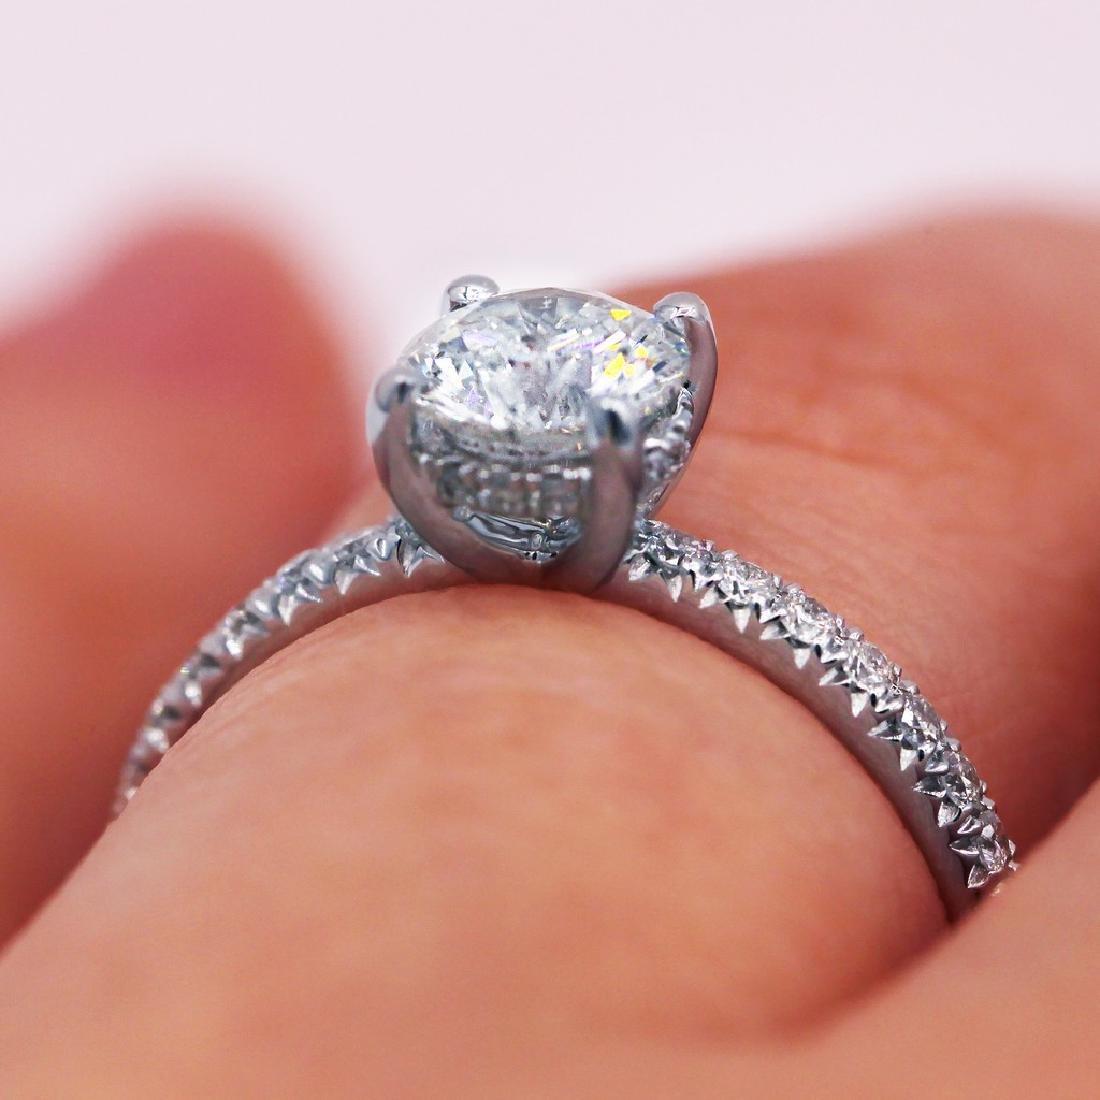 Sparkling 1.03 TCW round cut diamond pave engagement - 4